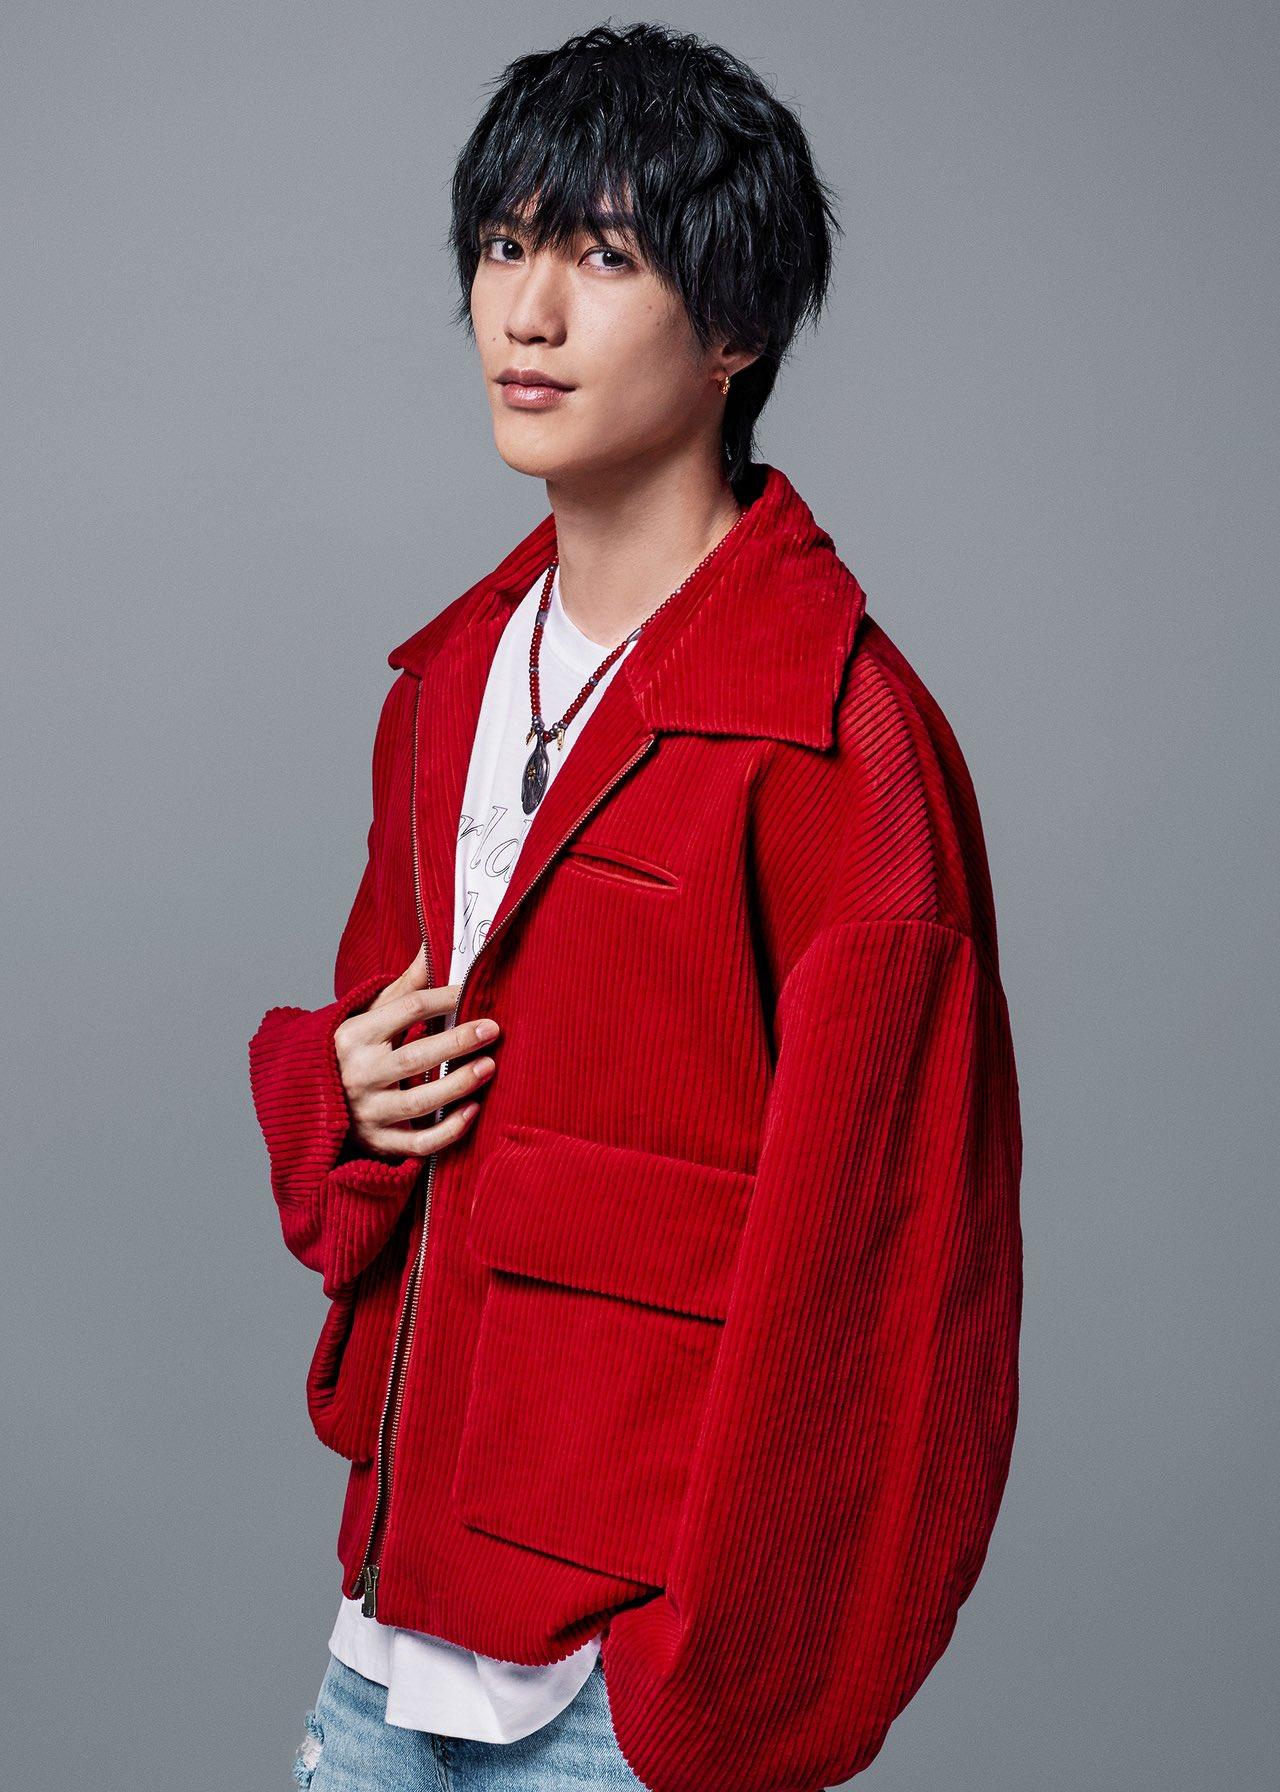 Fujiwara Itsuki